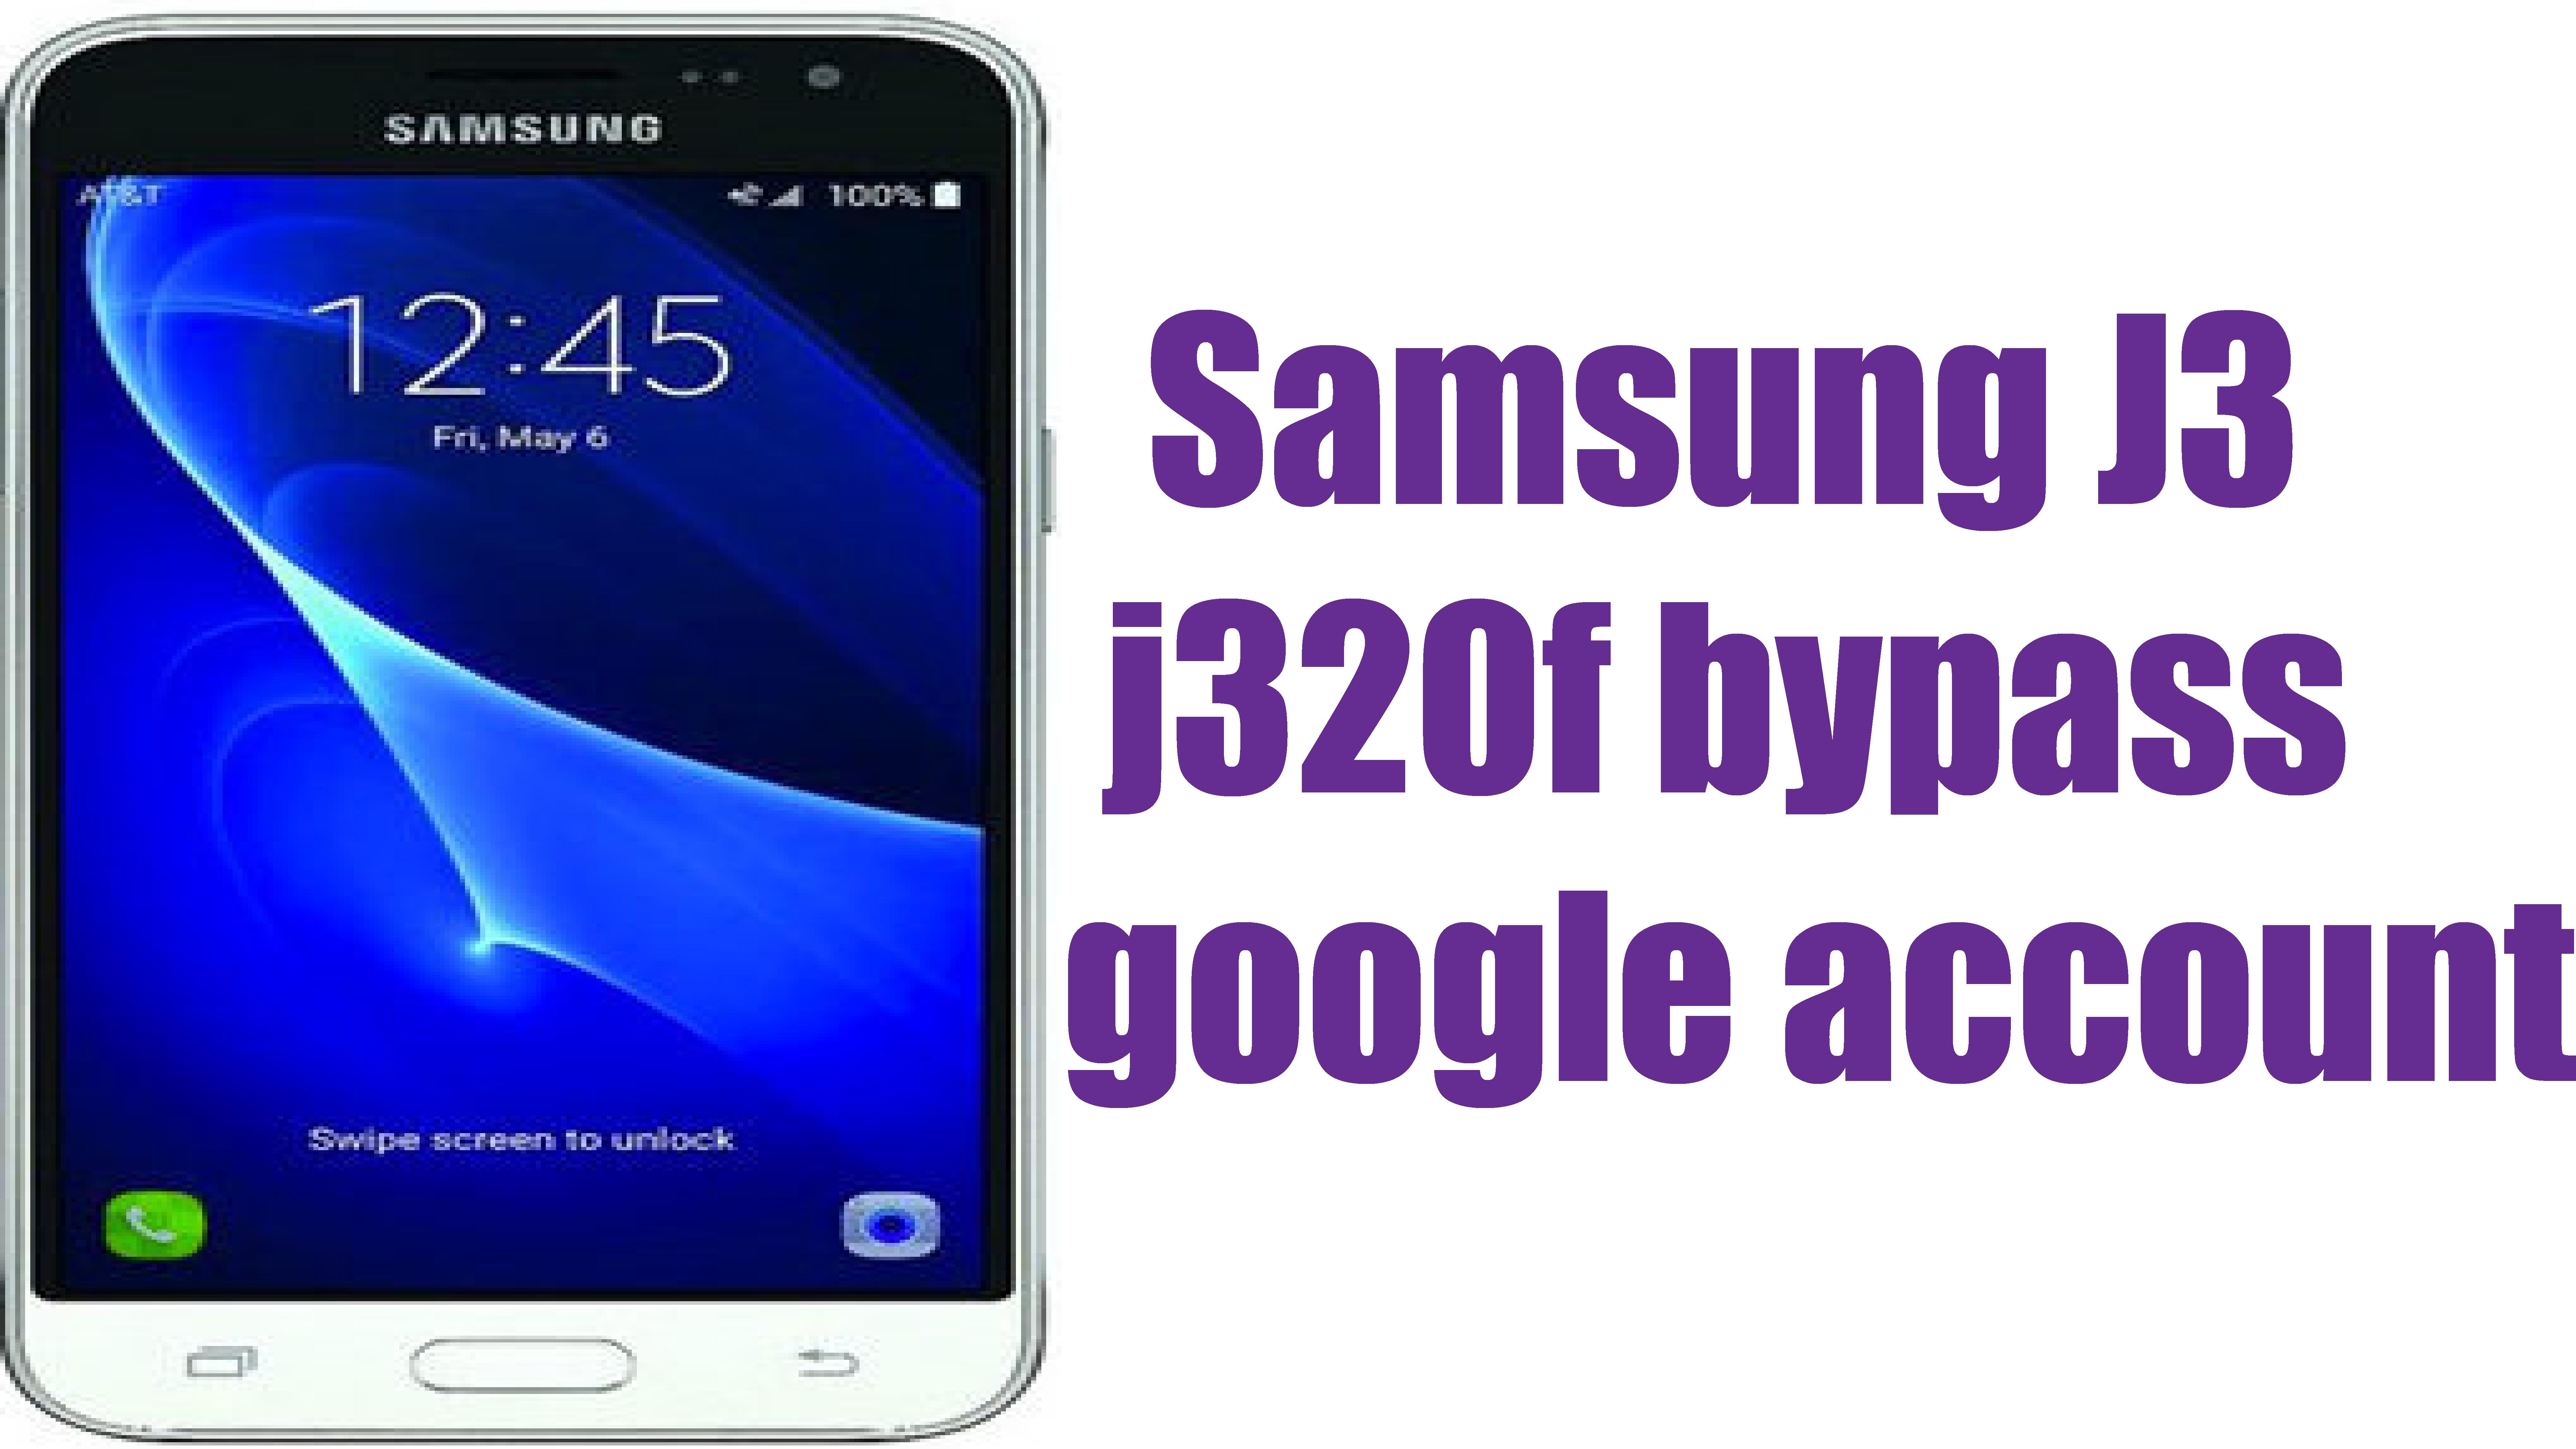 How To Bypass Frp On Samsung J320fn Samsung J3 2016 SMJ320FN